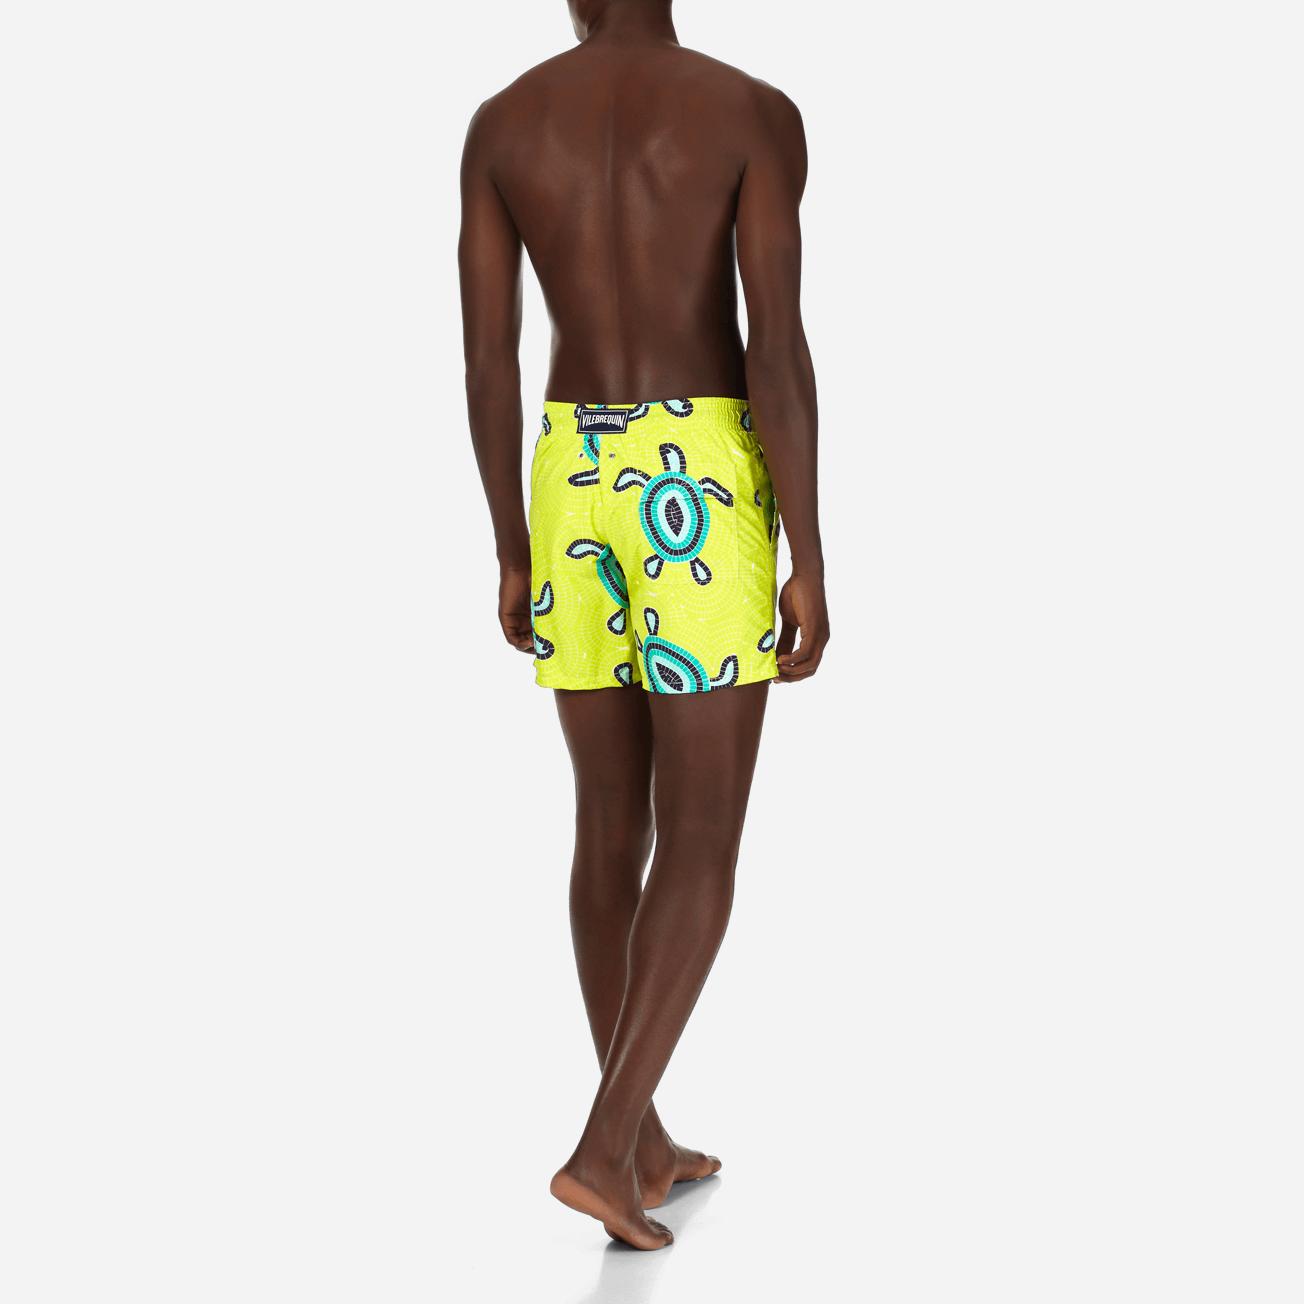 e91fd7afa68 Vilebrenquin Men s Classic   Moorea Printed Swimtrunks Mosaic Turtles in  Chartreuse